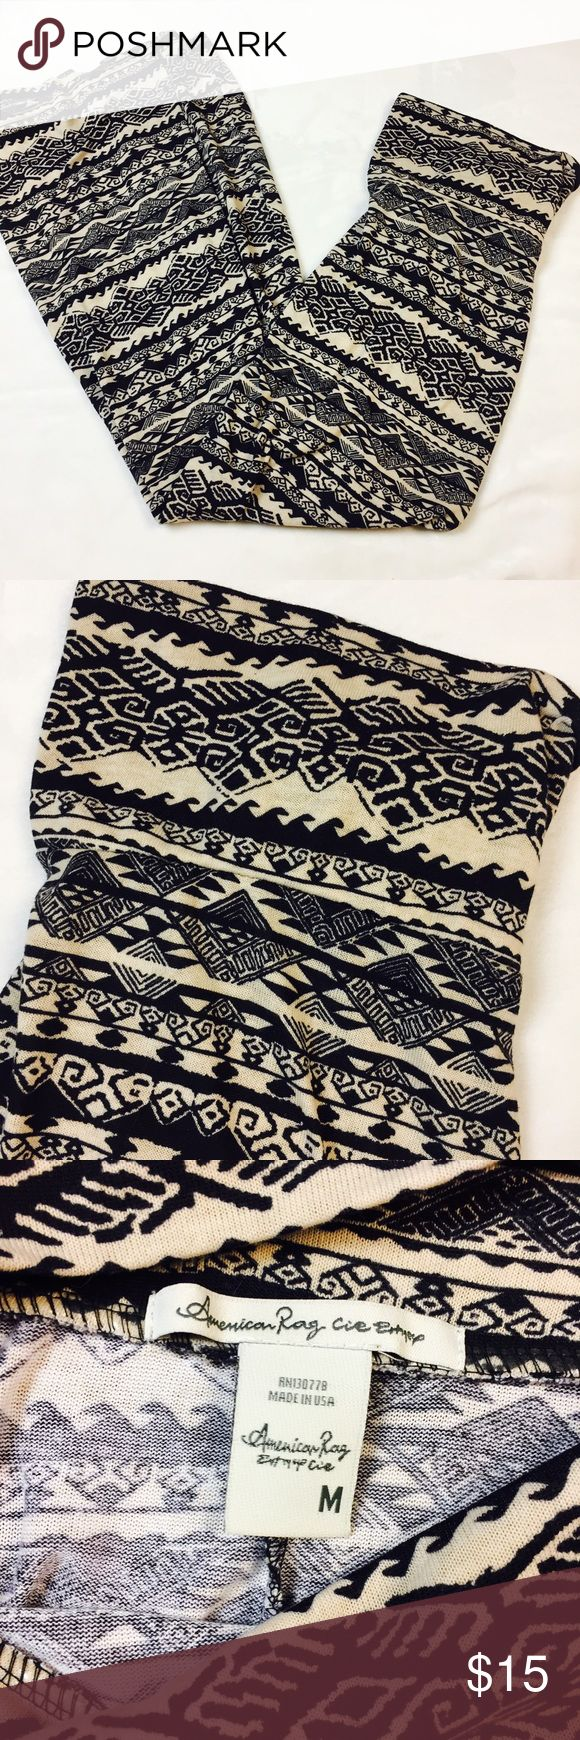 EUC American Rag tribal maxi skirt M EUC American Rag tan and black tribal maxi skirt. Soft material, extremely comfy! Size medium! American Rag Skirts Maxi